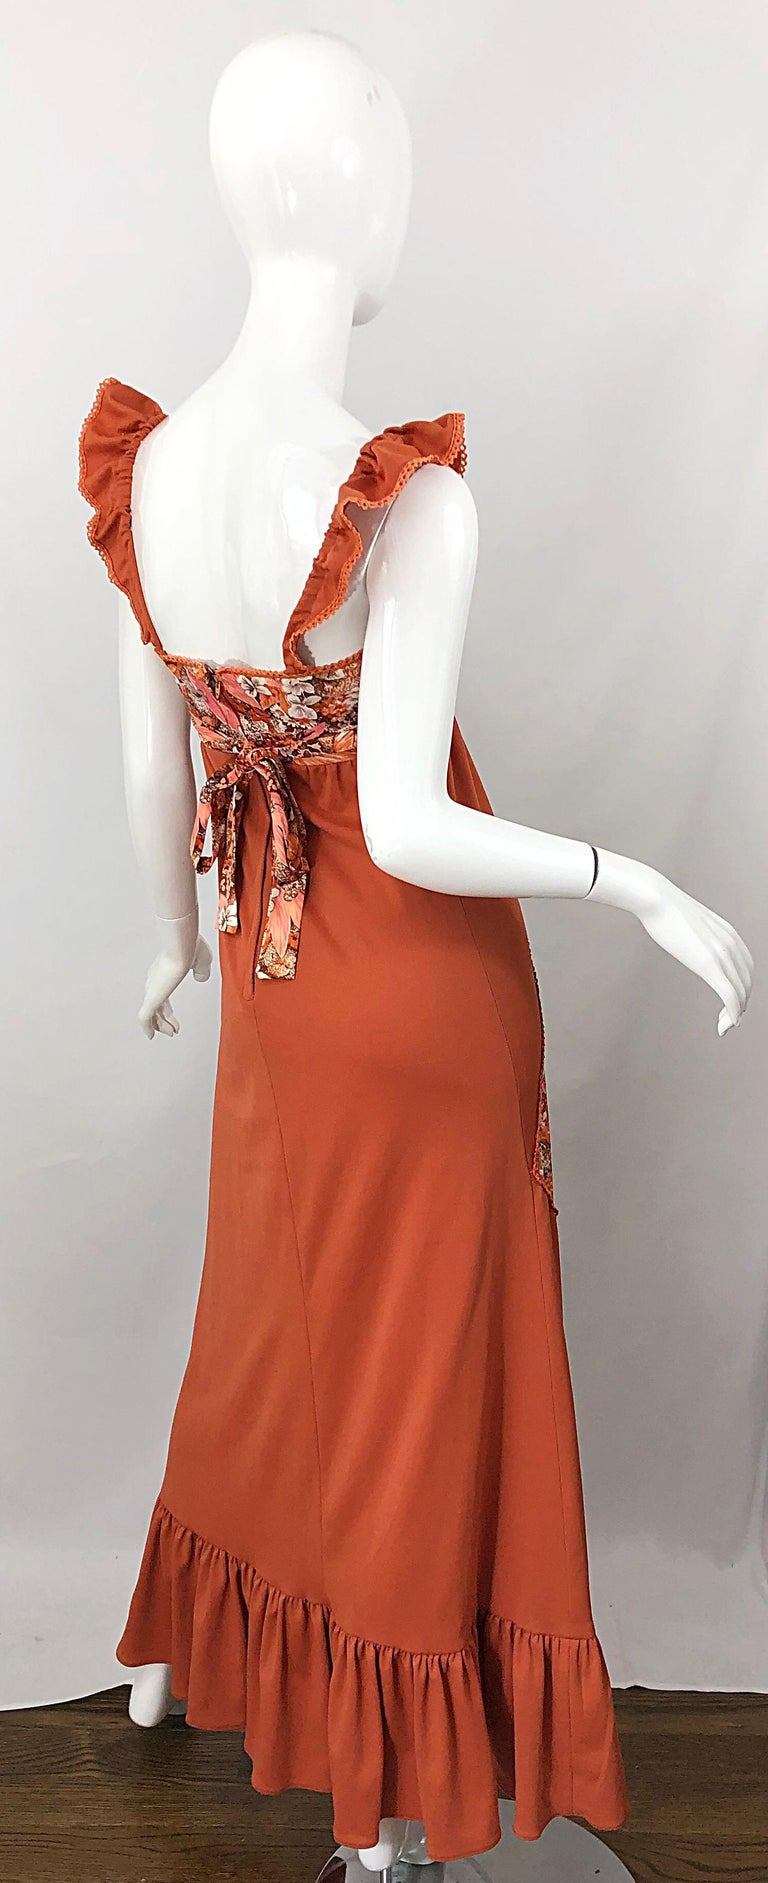 1970s Burnt Orange Patchwork Flowers Boho Vintage 70s Jersey Autumnal Maxi Dress For Sale 8